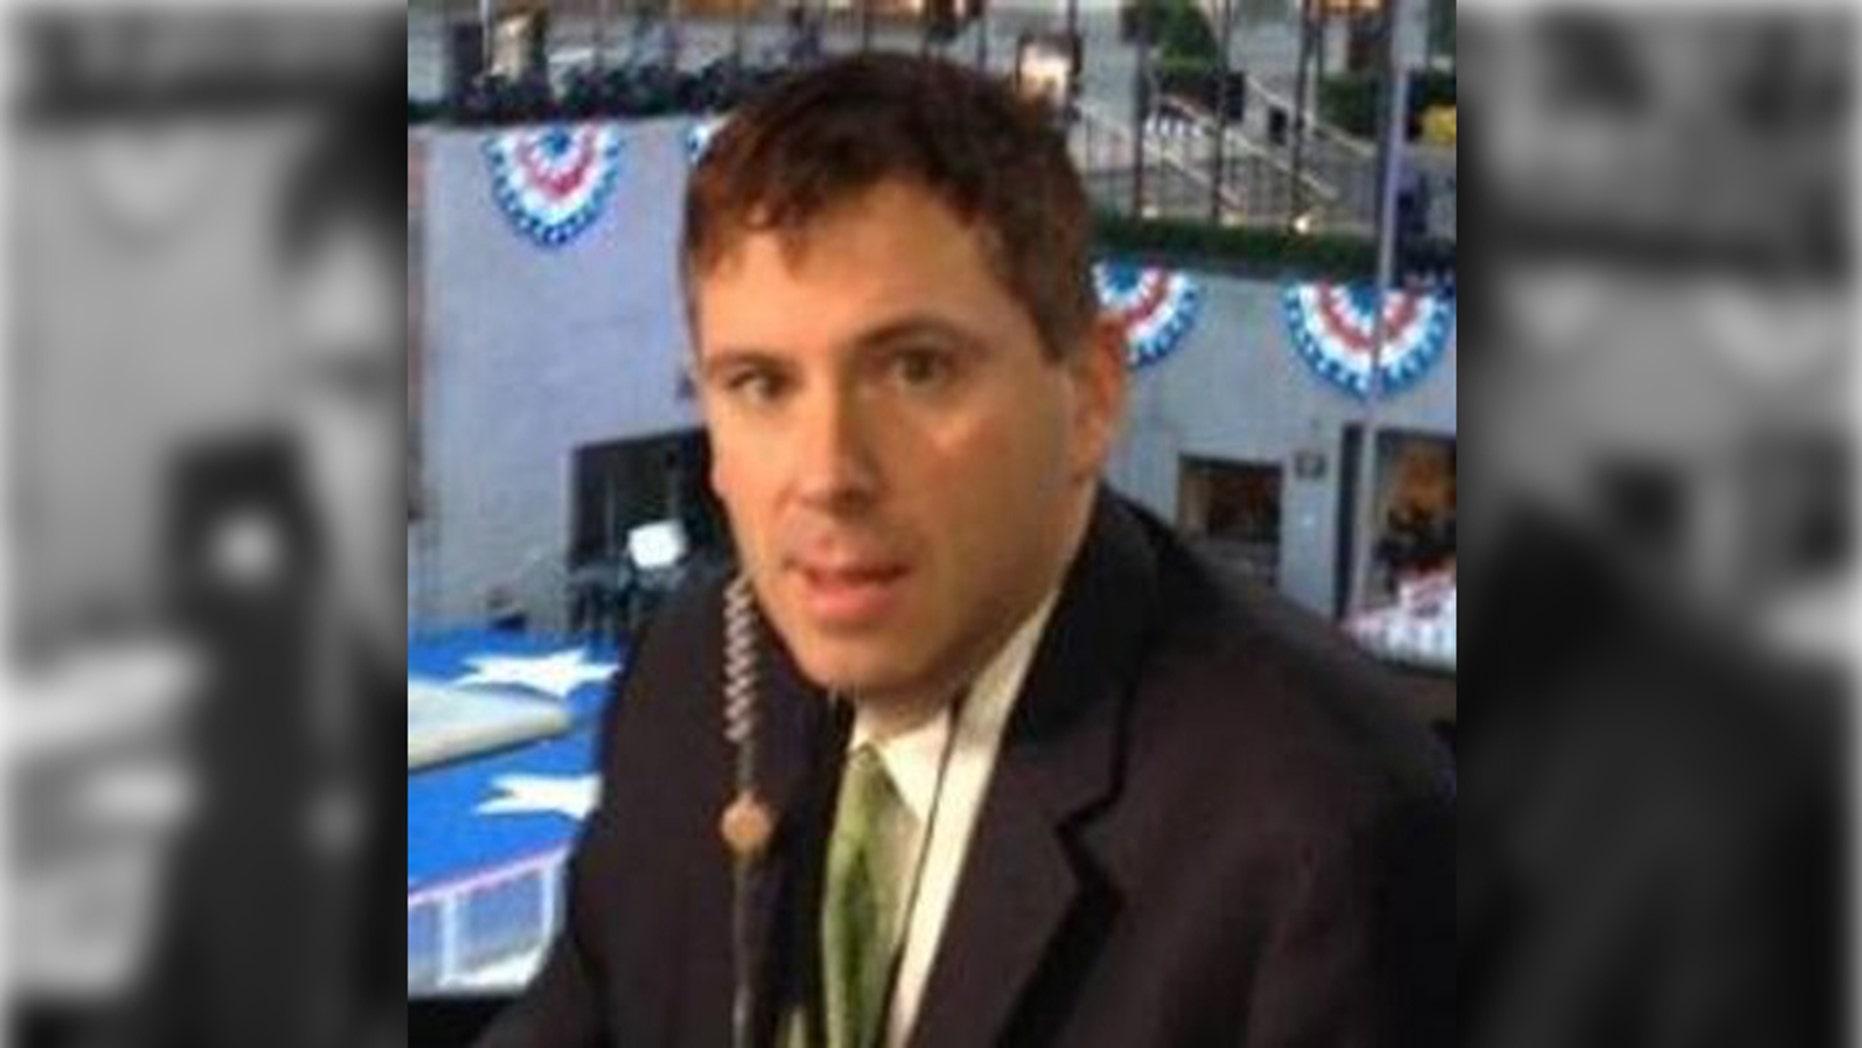 ABC News Executive Editorial Producer Chris Donovan raised eyebrows over his jab at President Trump on Twitter.